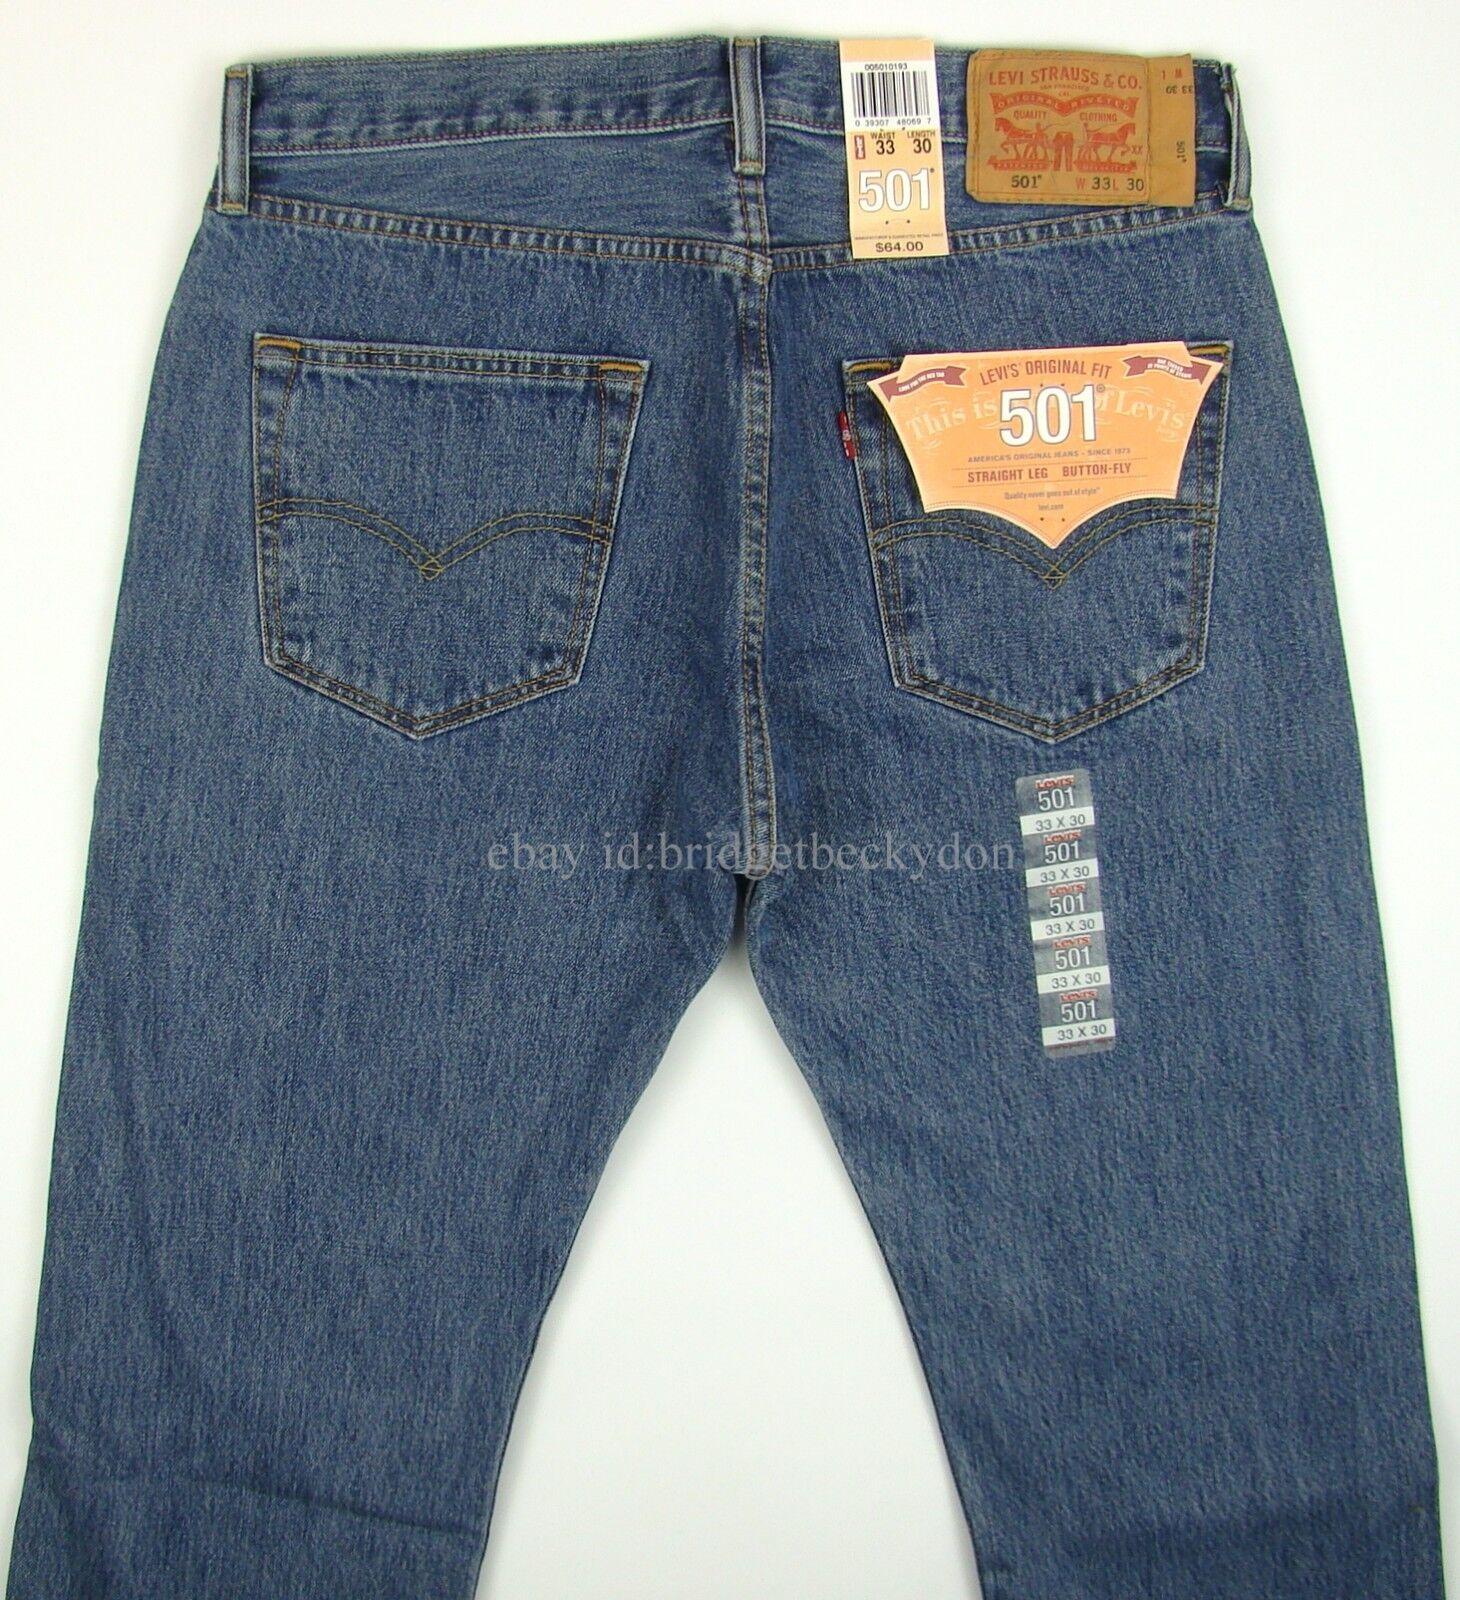 item 4 Levis 501 Jeans New Mens Original Button Fly NWT 29 30 31 32 33 34  36 38 40 42 -Levis 501 Jeans New Mens Original Button Fly NWT 29 30 31 32 33  34 36 ... 0c1792b231